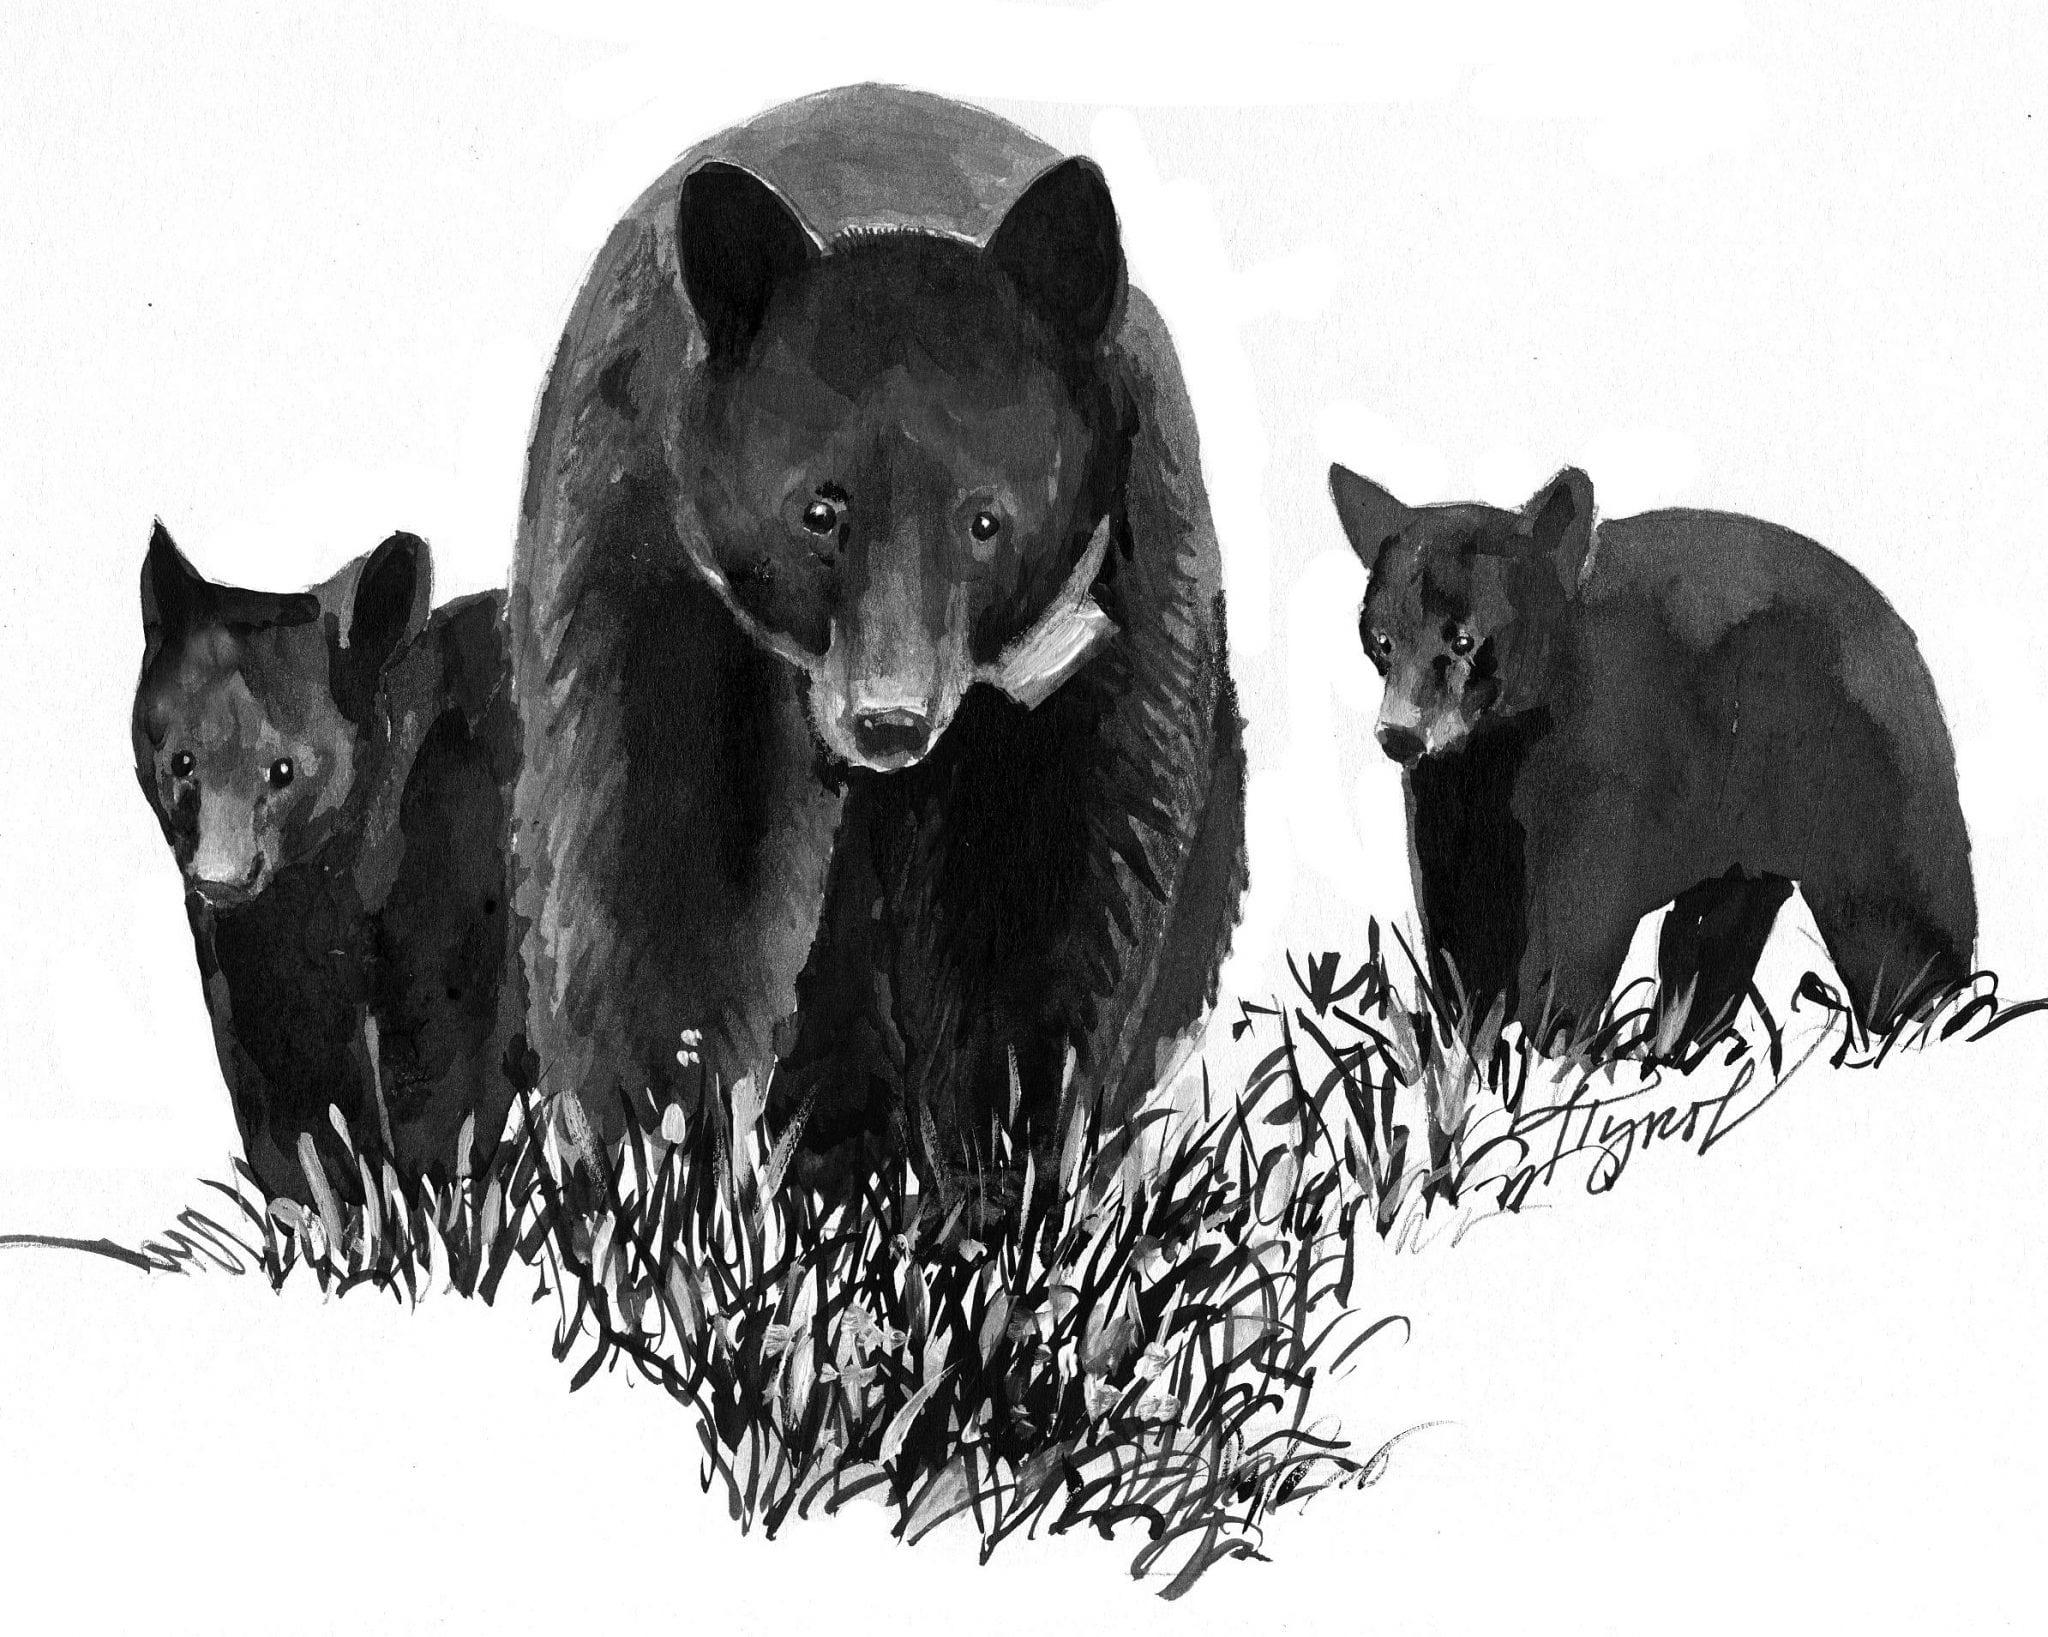 Black bear cub with creamy white coat baffles scientists - AOL News